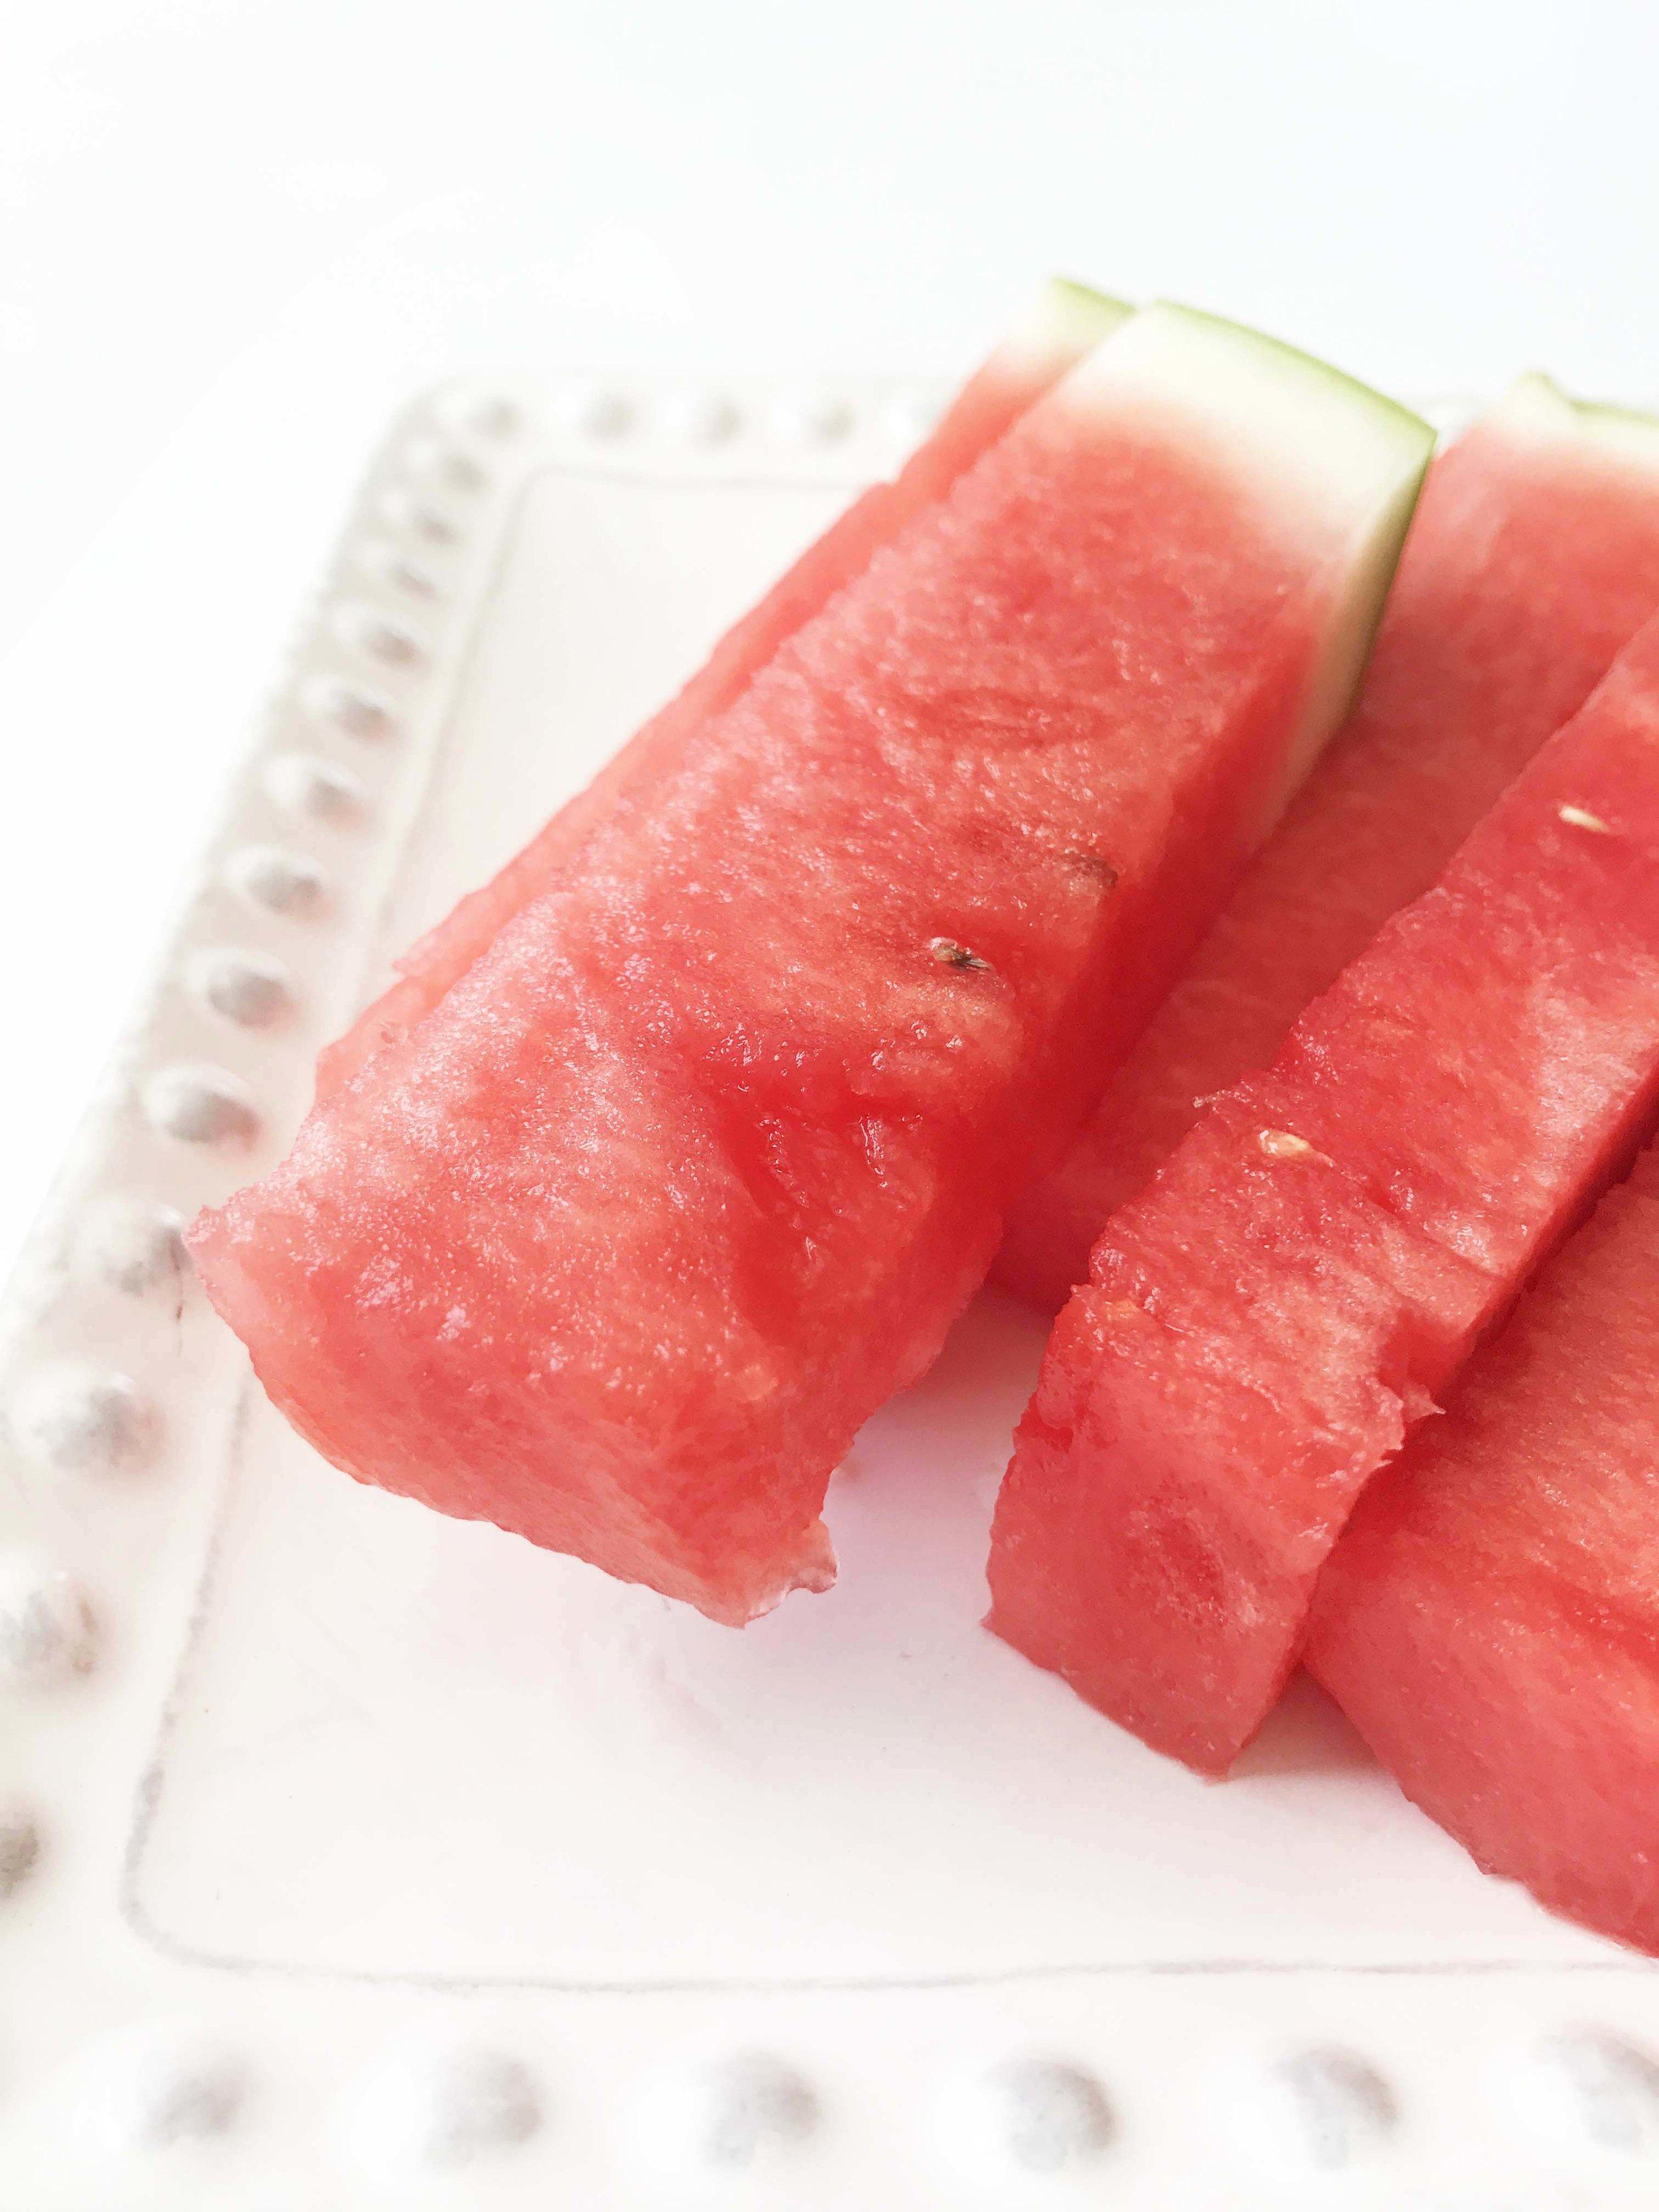 cutting-watermelon6.jpg